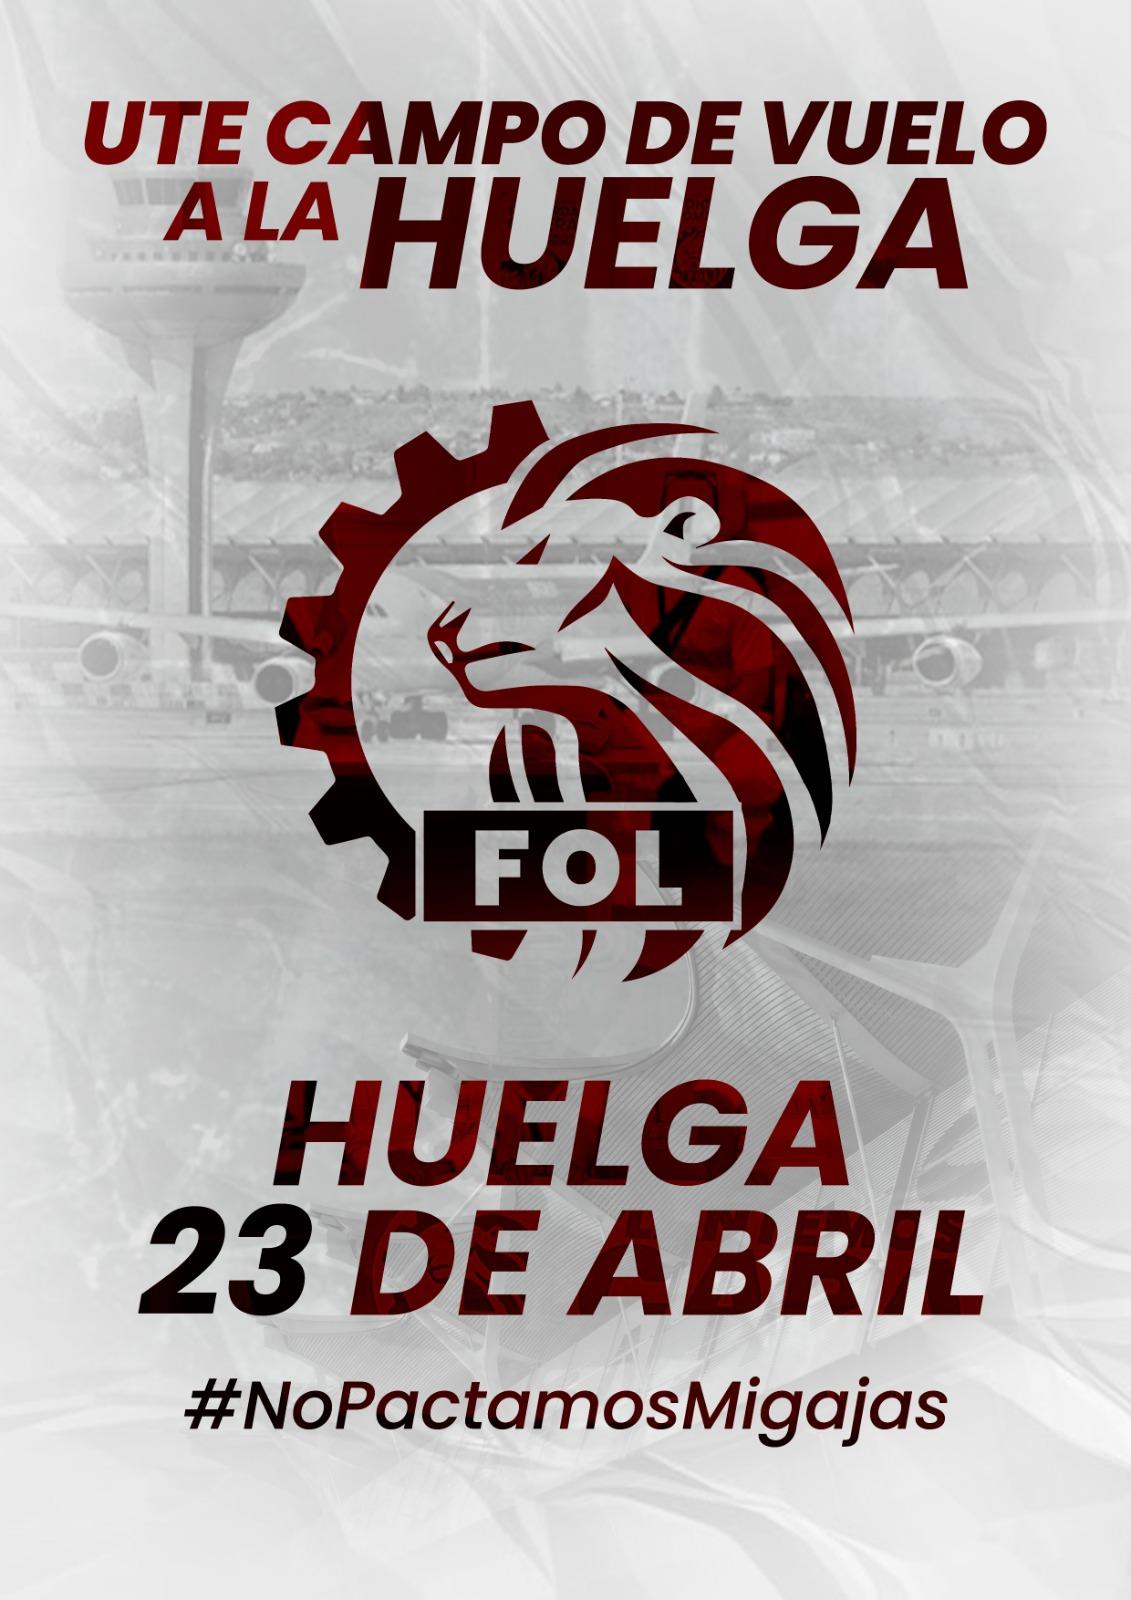 Huelga 23 De Abril De Trabajadores UTE Campo De Vuelo